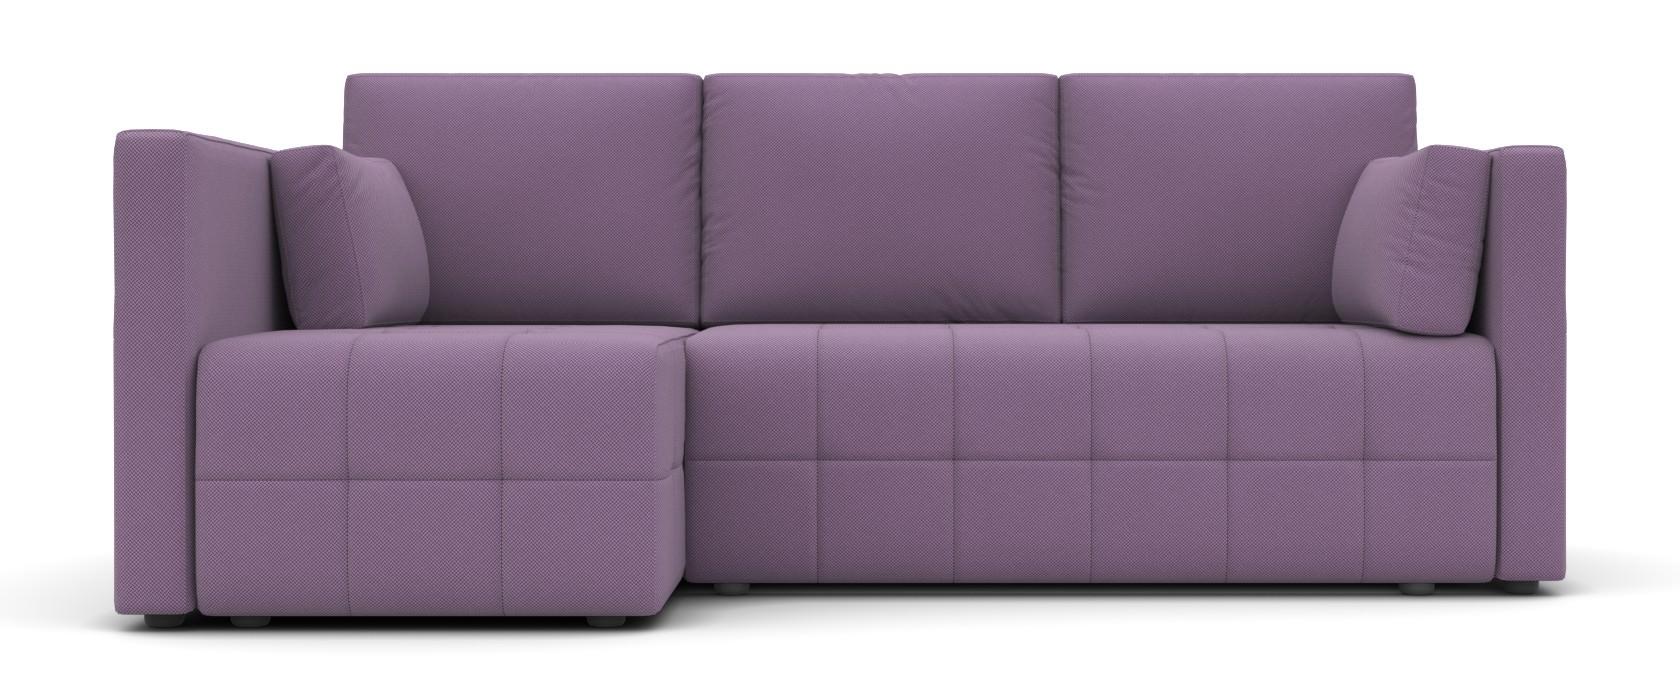 Кутовий диван Sofia - Pufetto